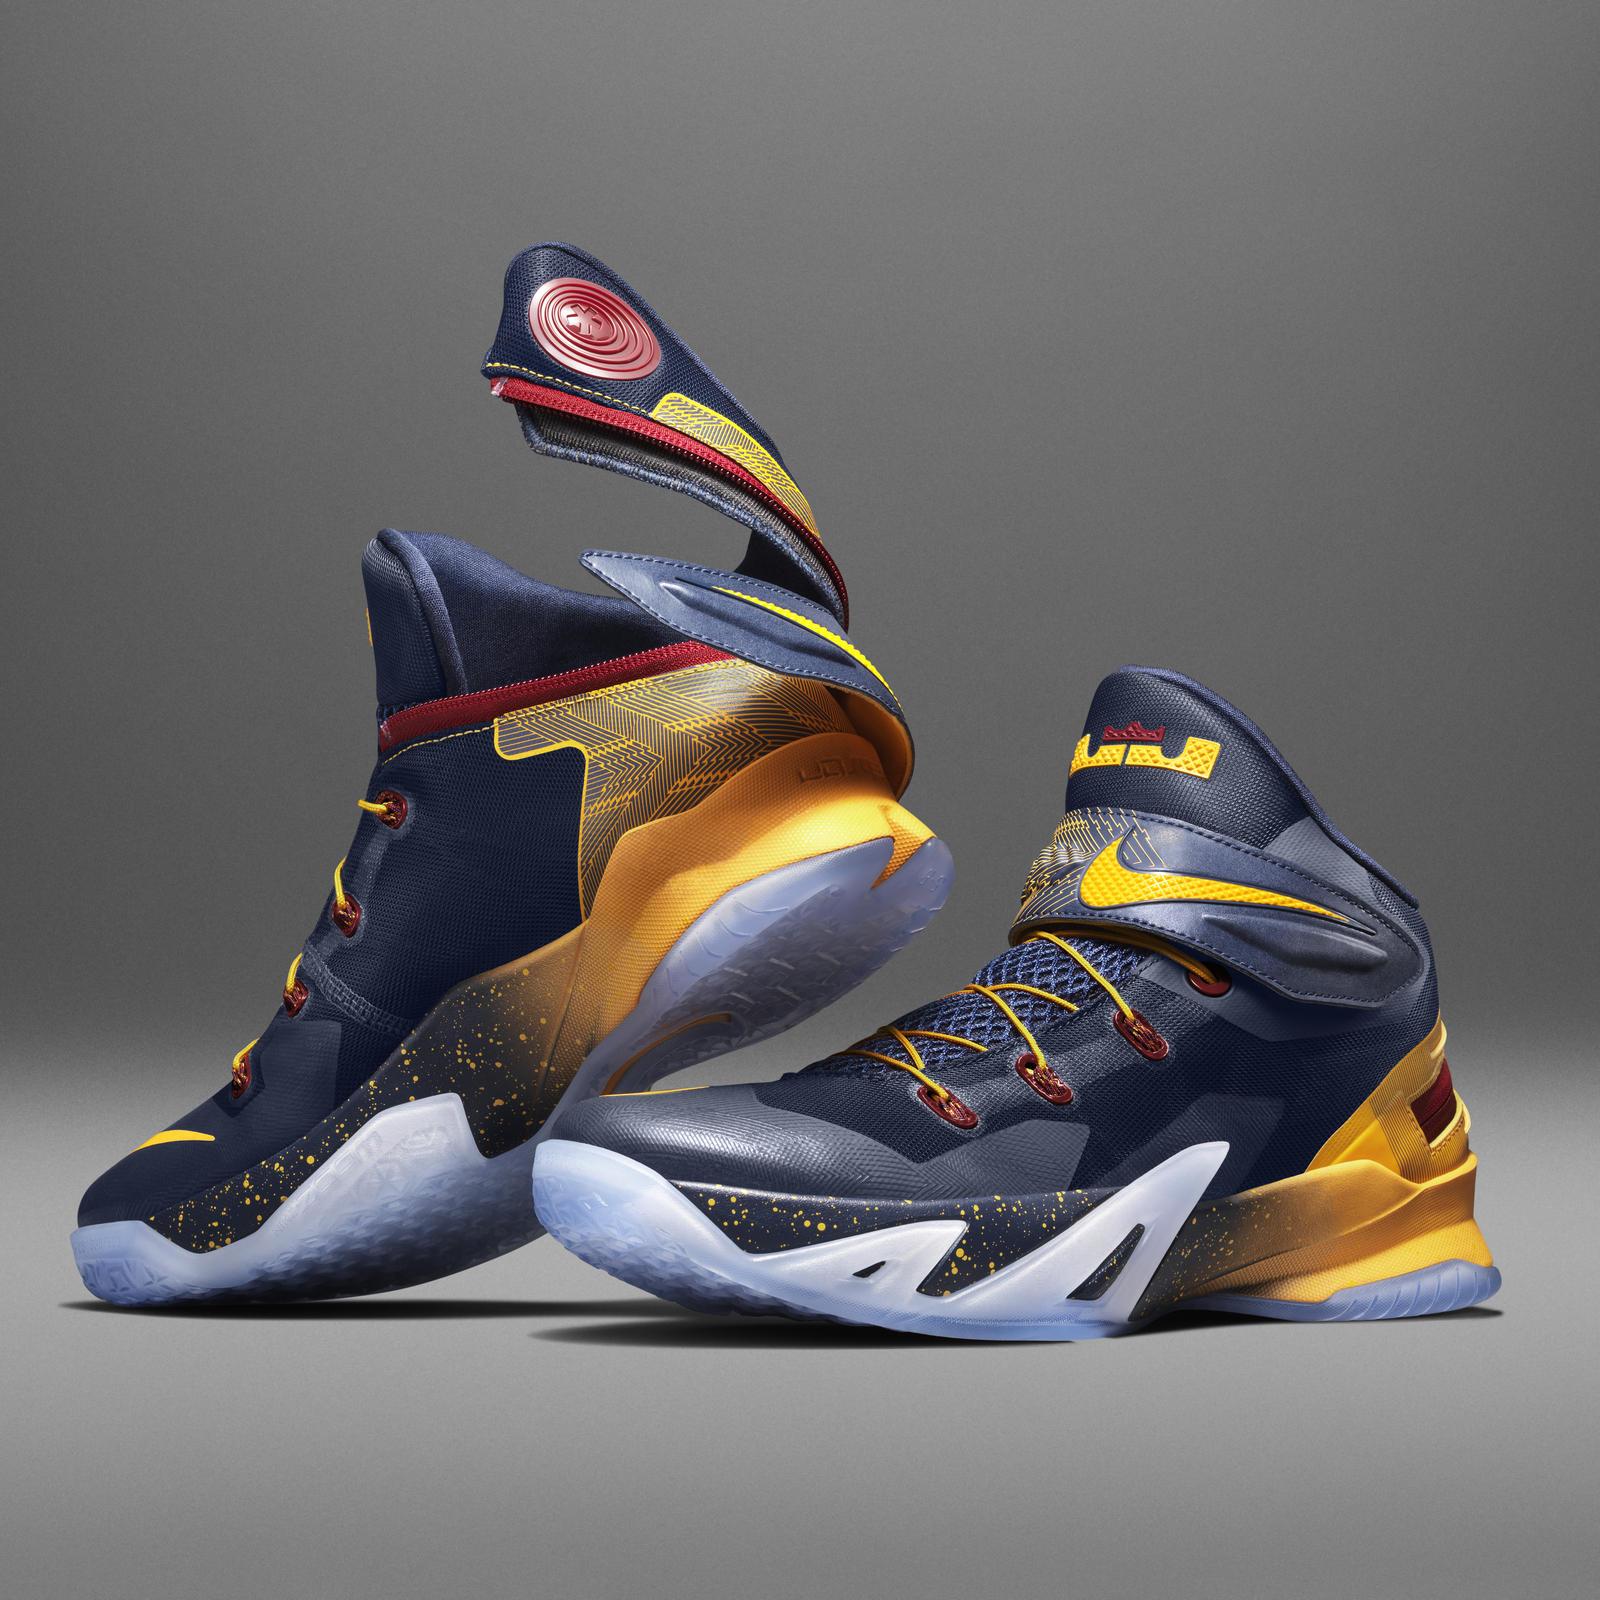 sale retailer 0a1df 96453 lebron james nike shoes for kids nike trainers